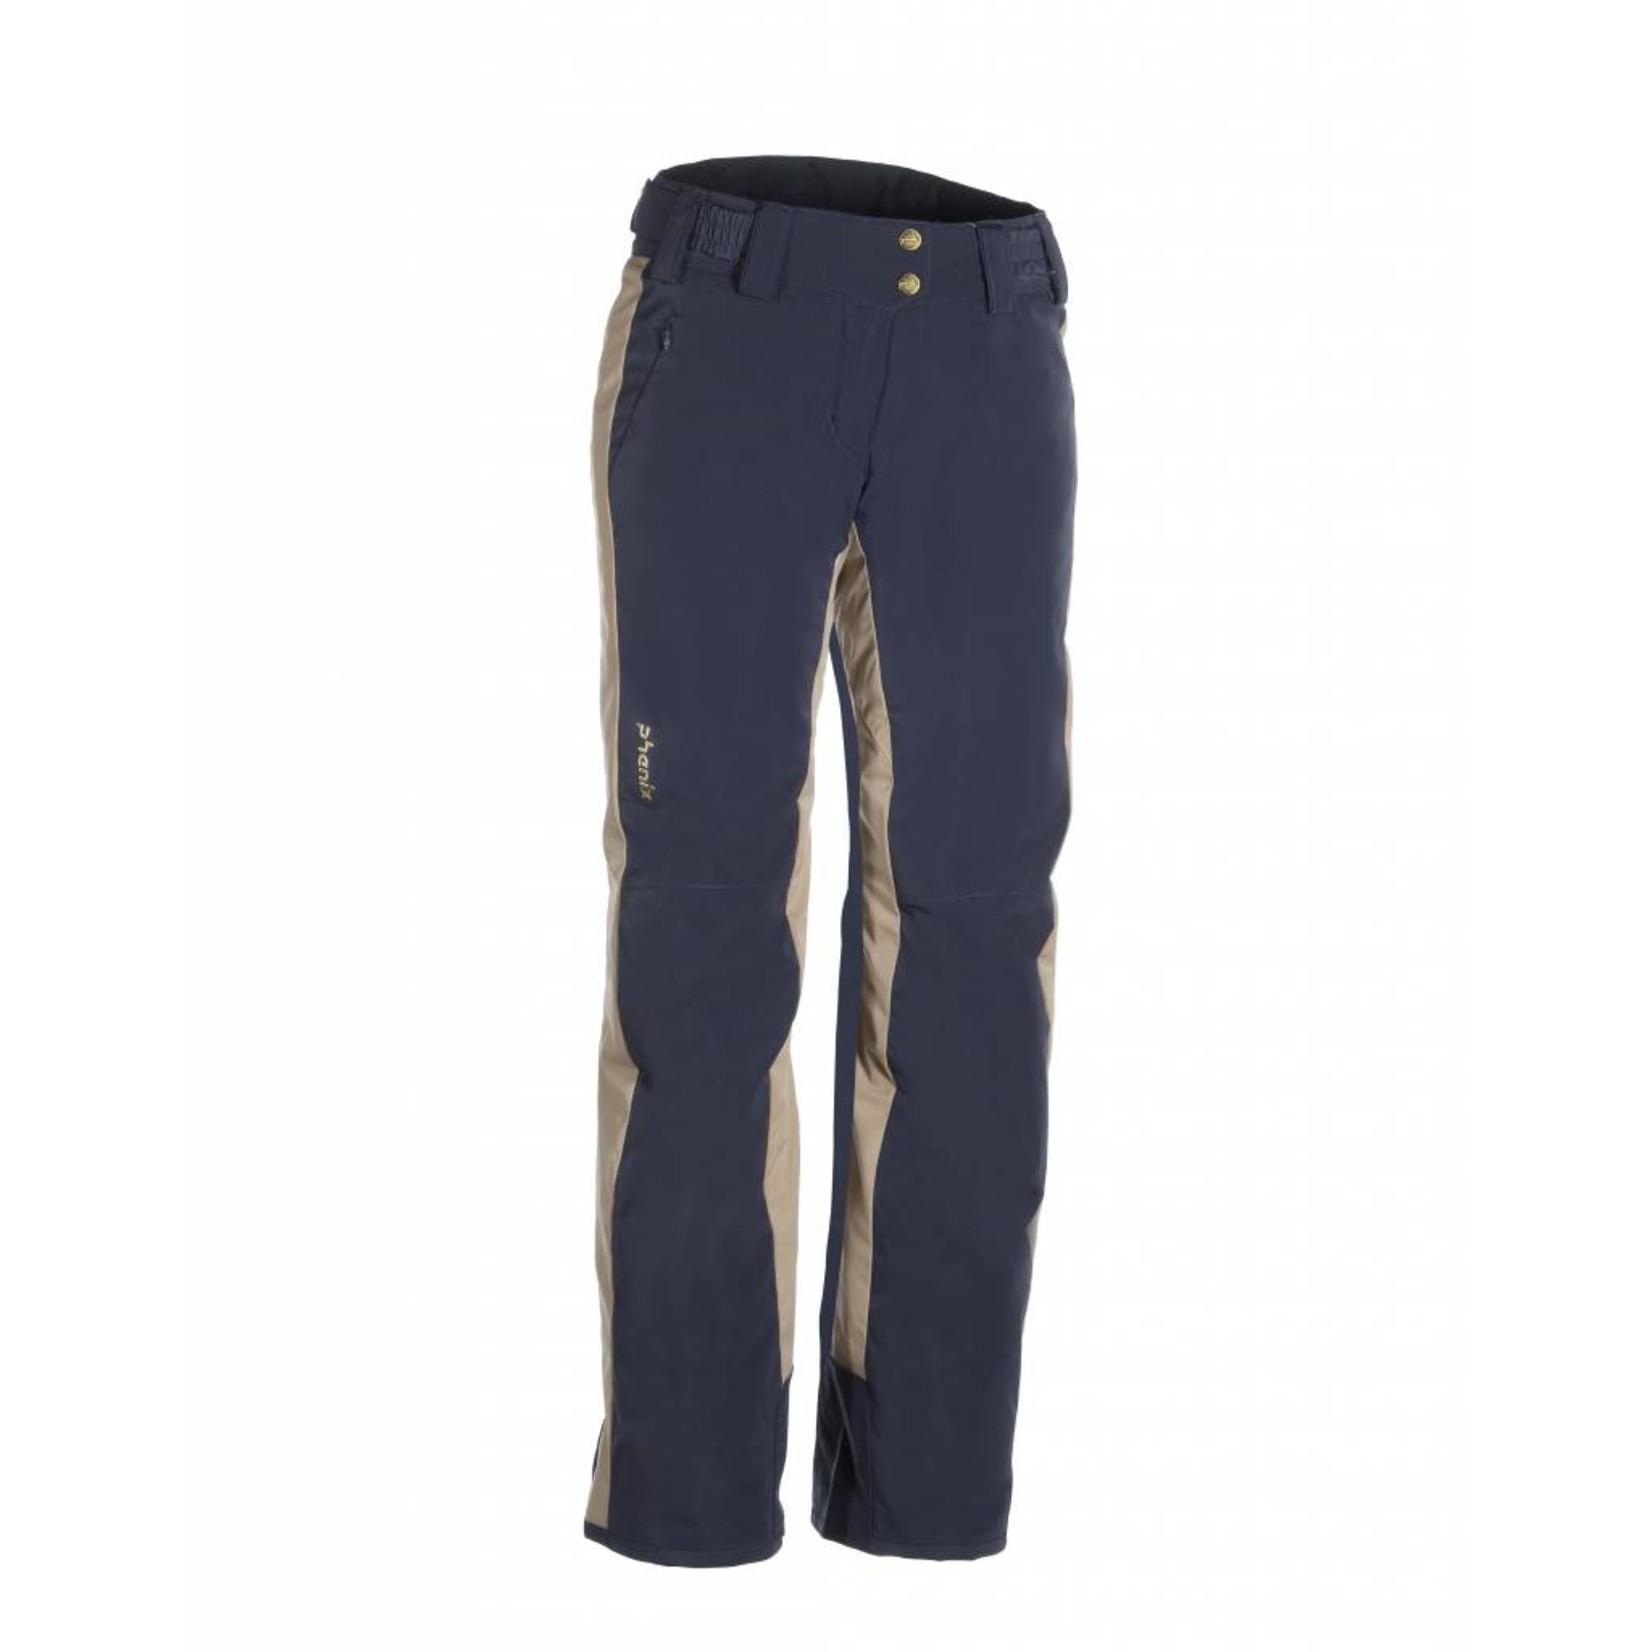 PHENIX  Lily Waist Pants - INBE